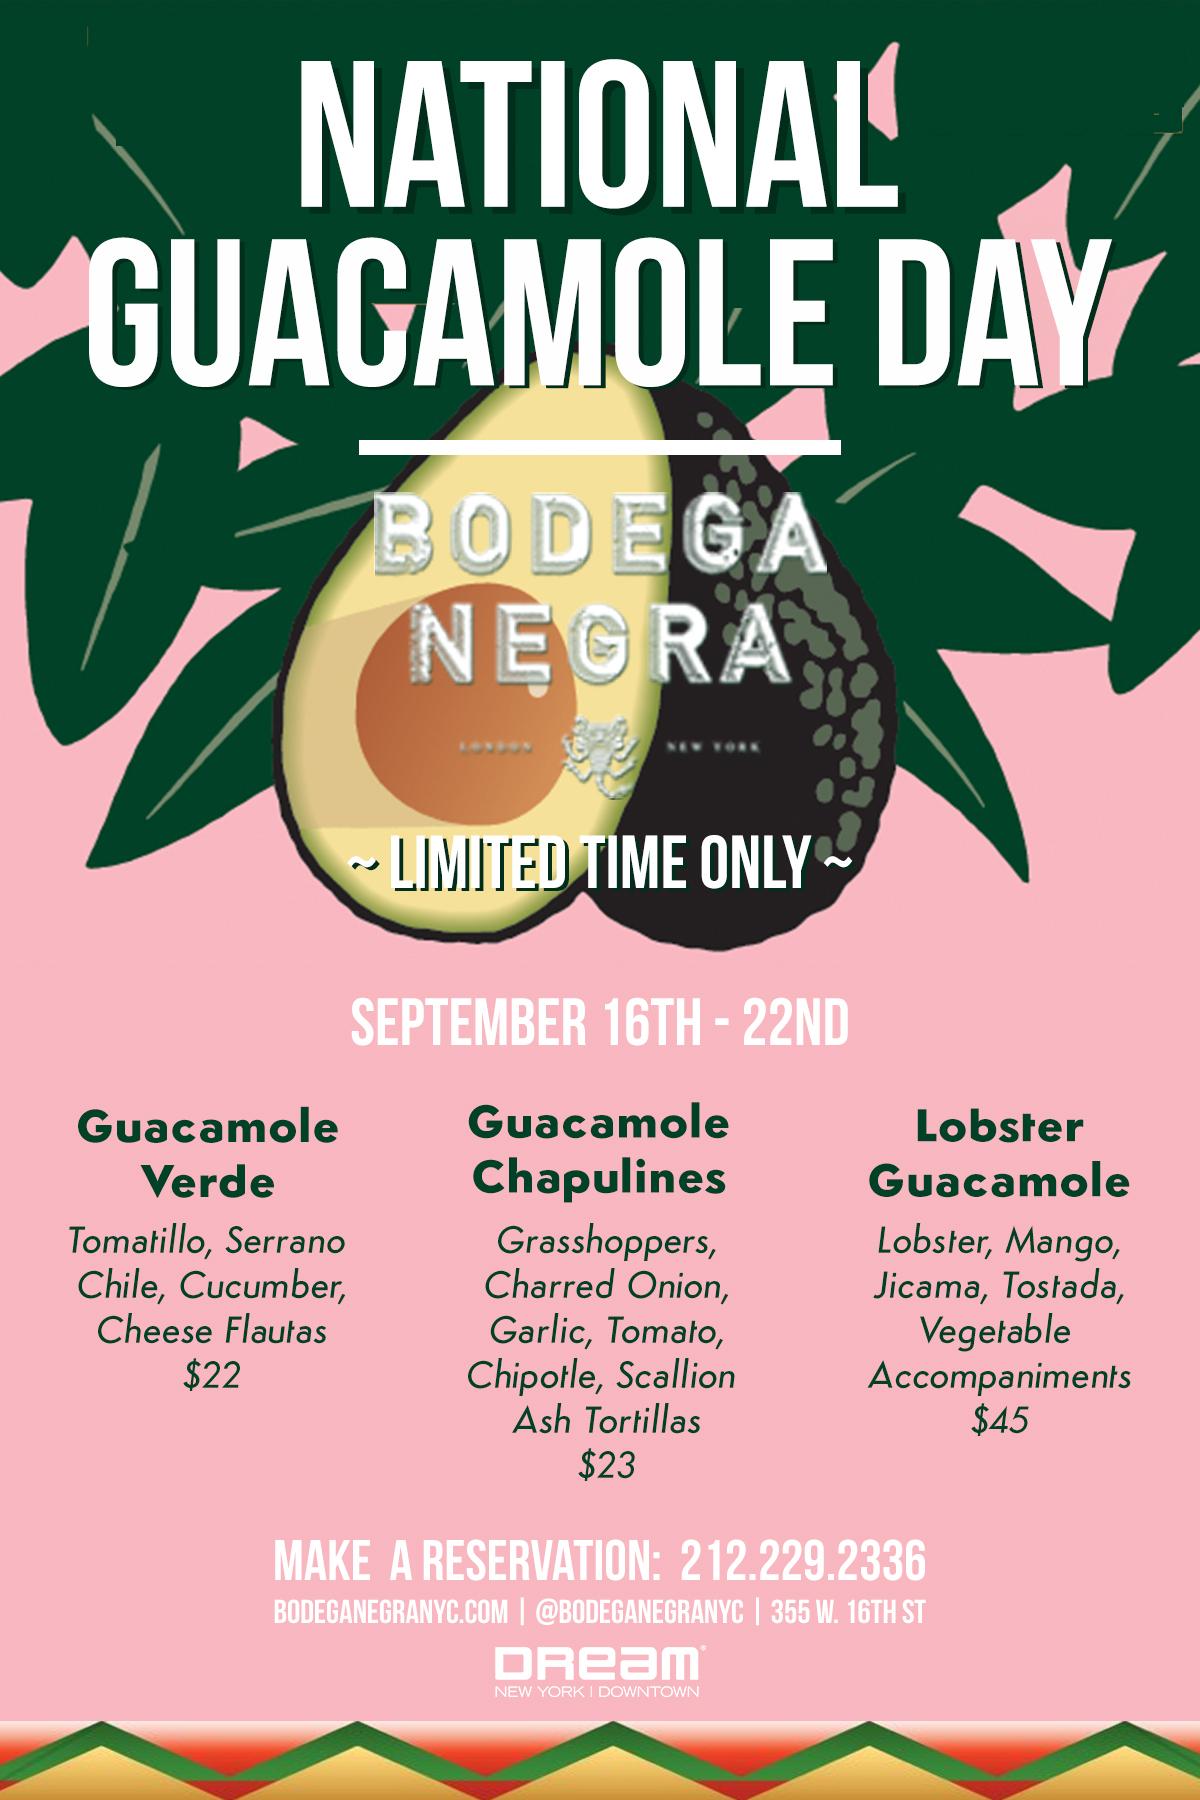 Bodega Negra Guacamole Day